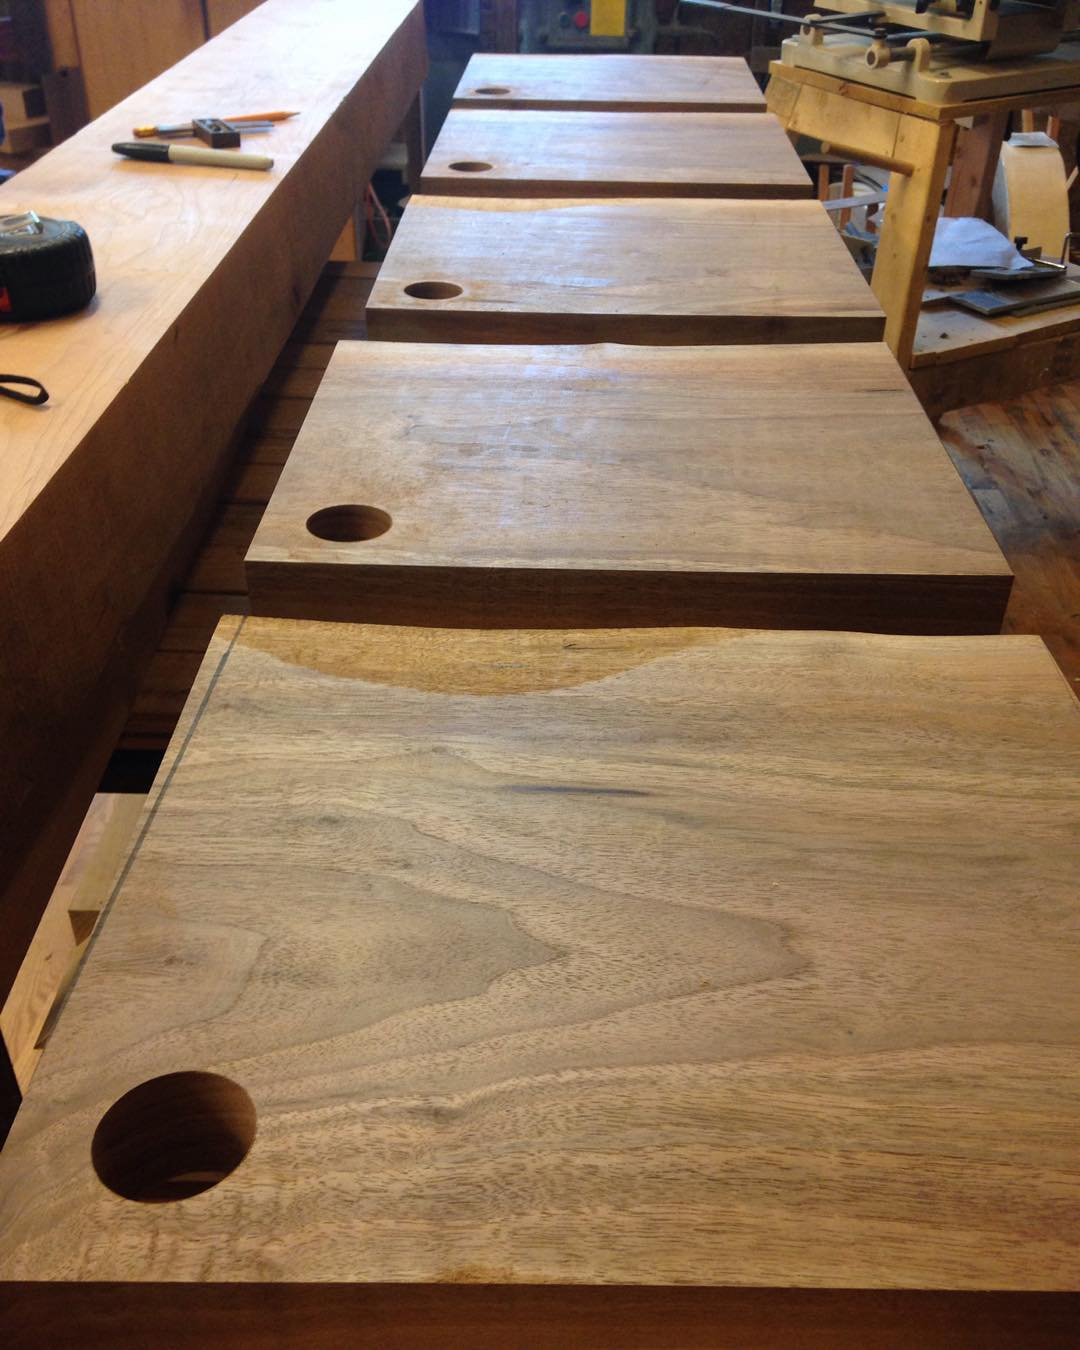 "Soon to be ""choppin broccoli, choppin broccolie, choppin broccolo""  #walnut #mcmfurniture #cuttingboard #natural #live #liveedge #handmade #woodshop #woodwork #woodworking #madeinusa #madeinmichigan  http://ift.tt/1QGJgH3"